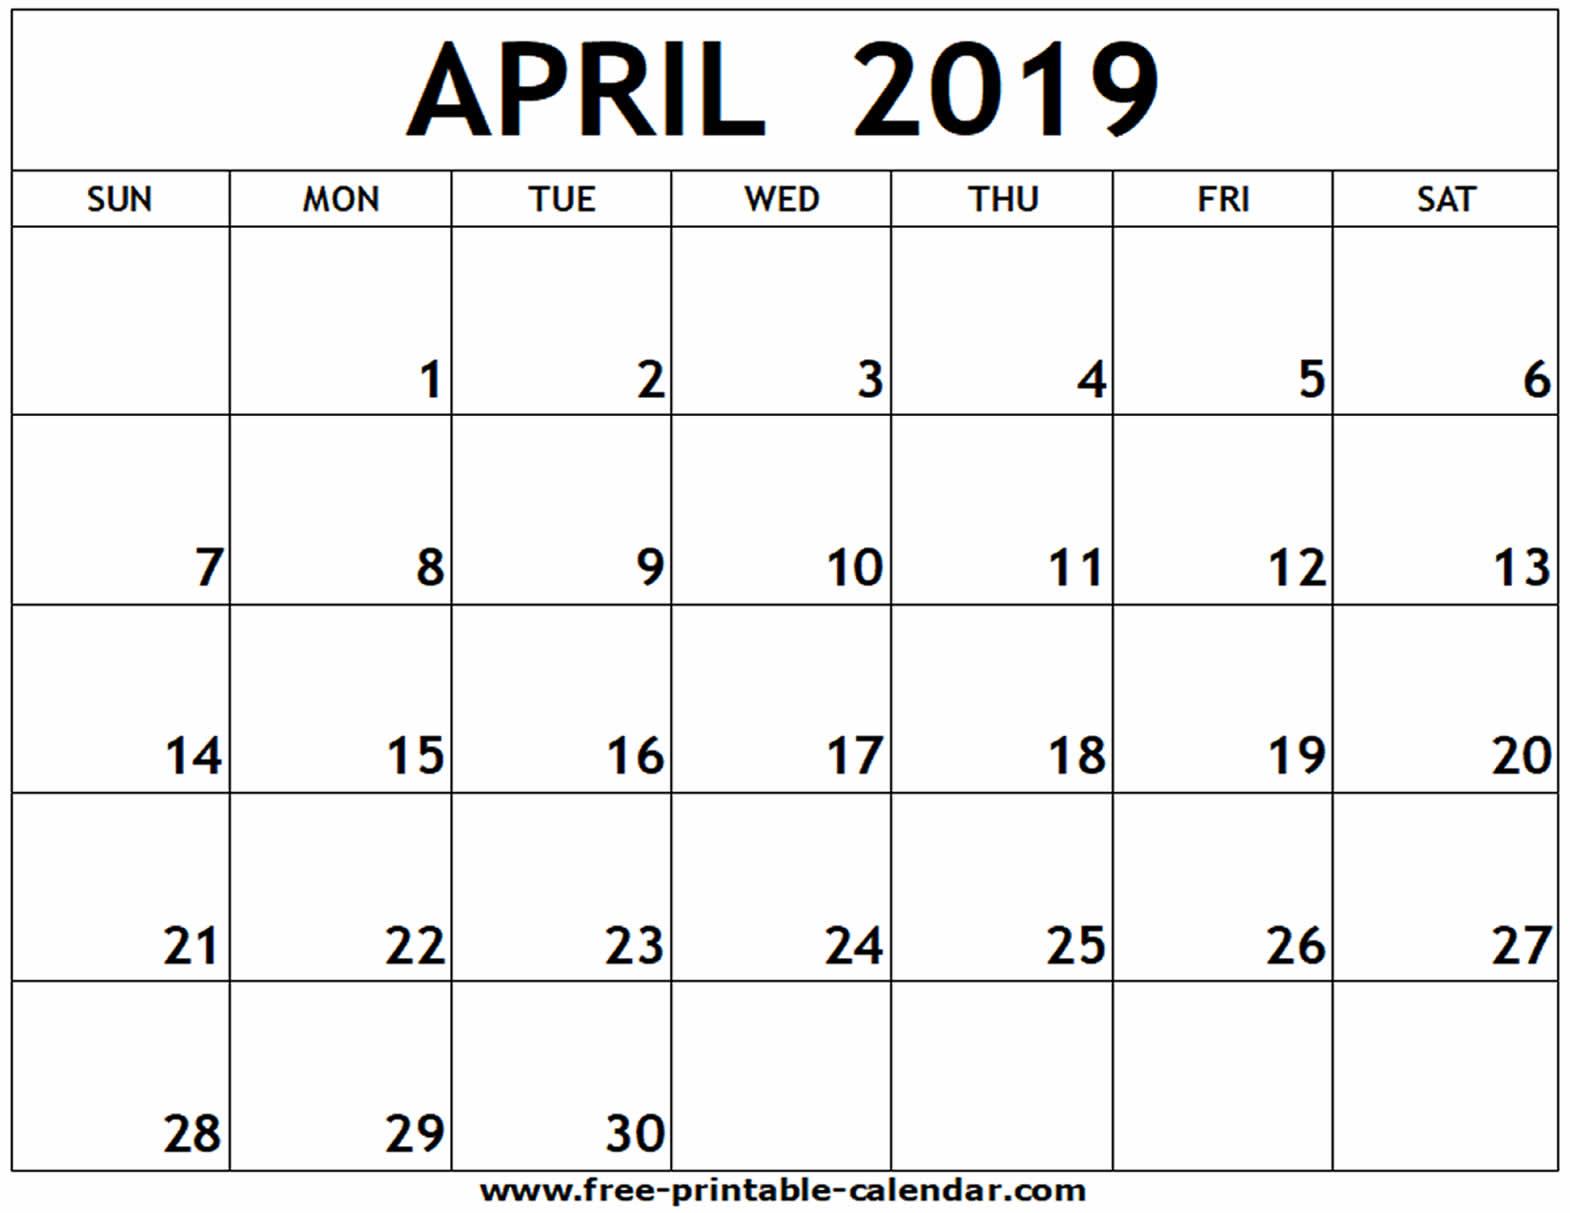 April 2019 Printable Calendar - Free-Printable-Calendar in Print Off A Blank Calendar For